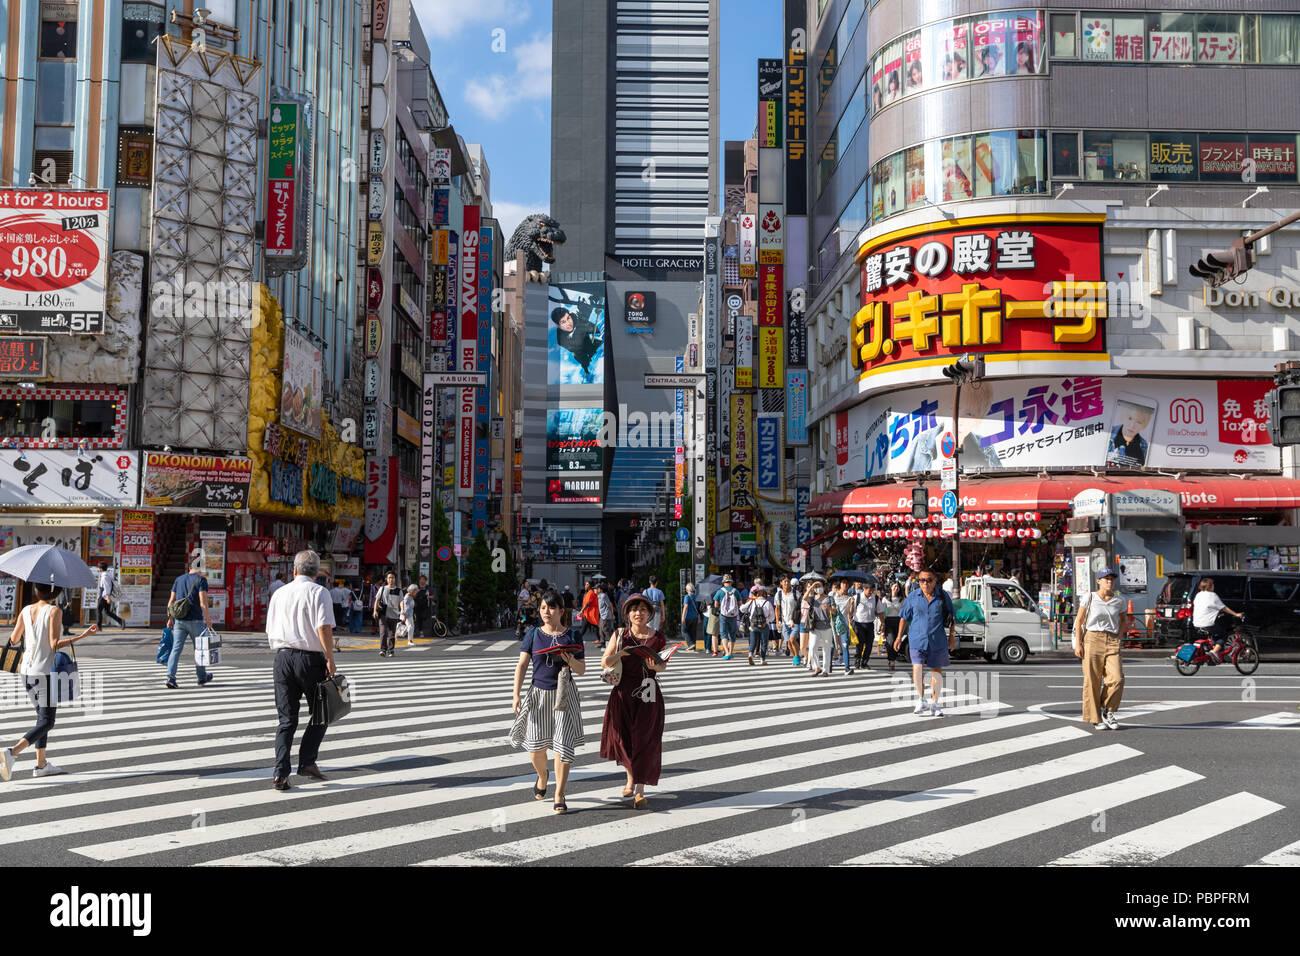 Zebra crossing, Yasukuni Dori, Shinjuku, Tokyo, Japan - Stock Image